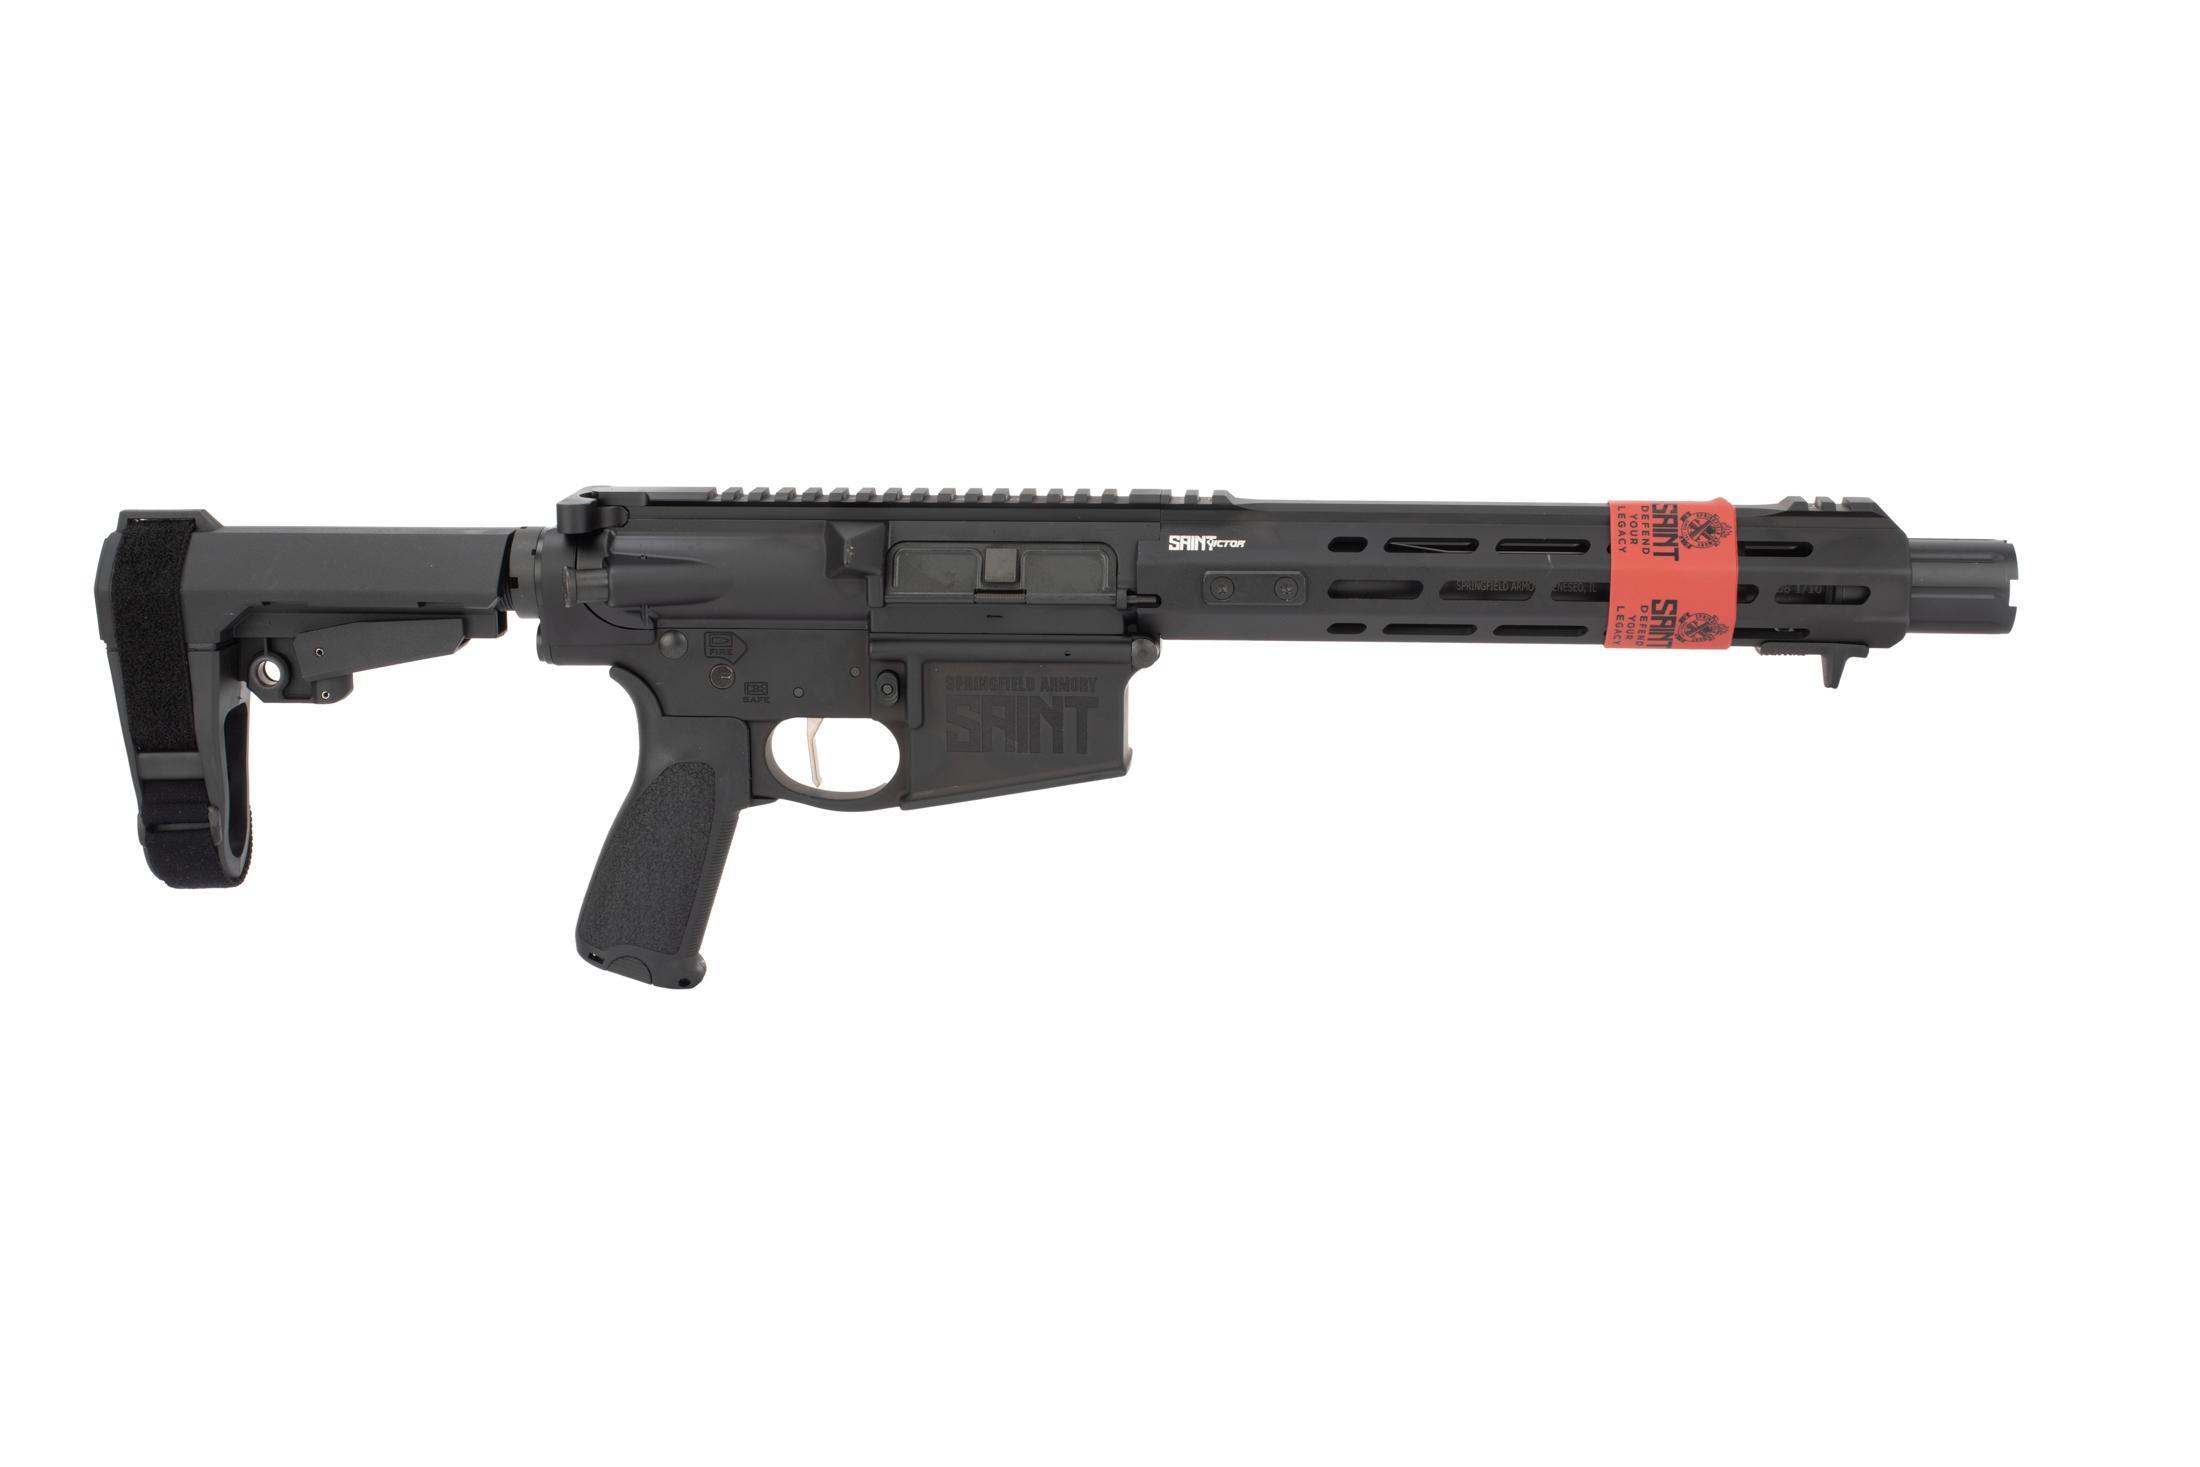 Springfield Armory Saint .308 AR 10 Pistol features a 10.3 inch barrel